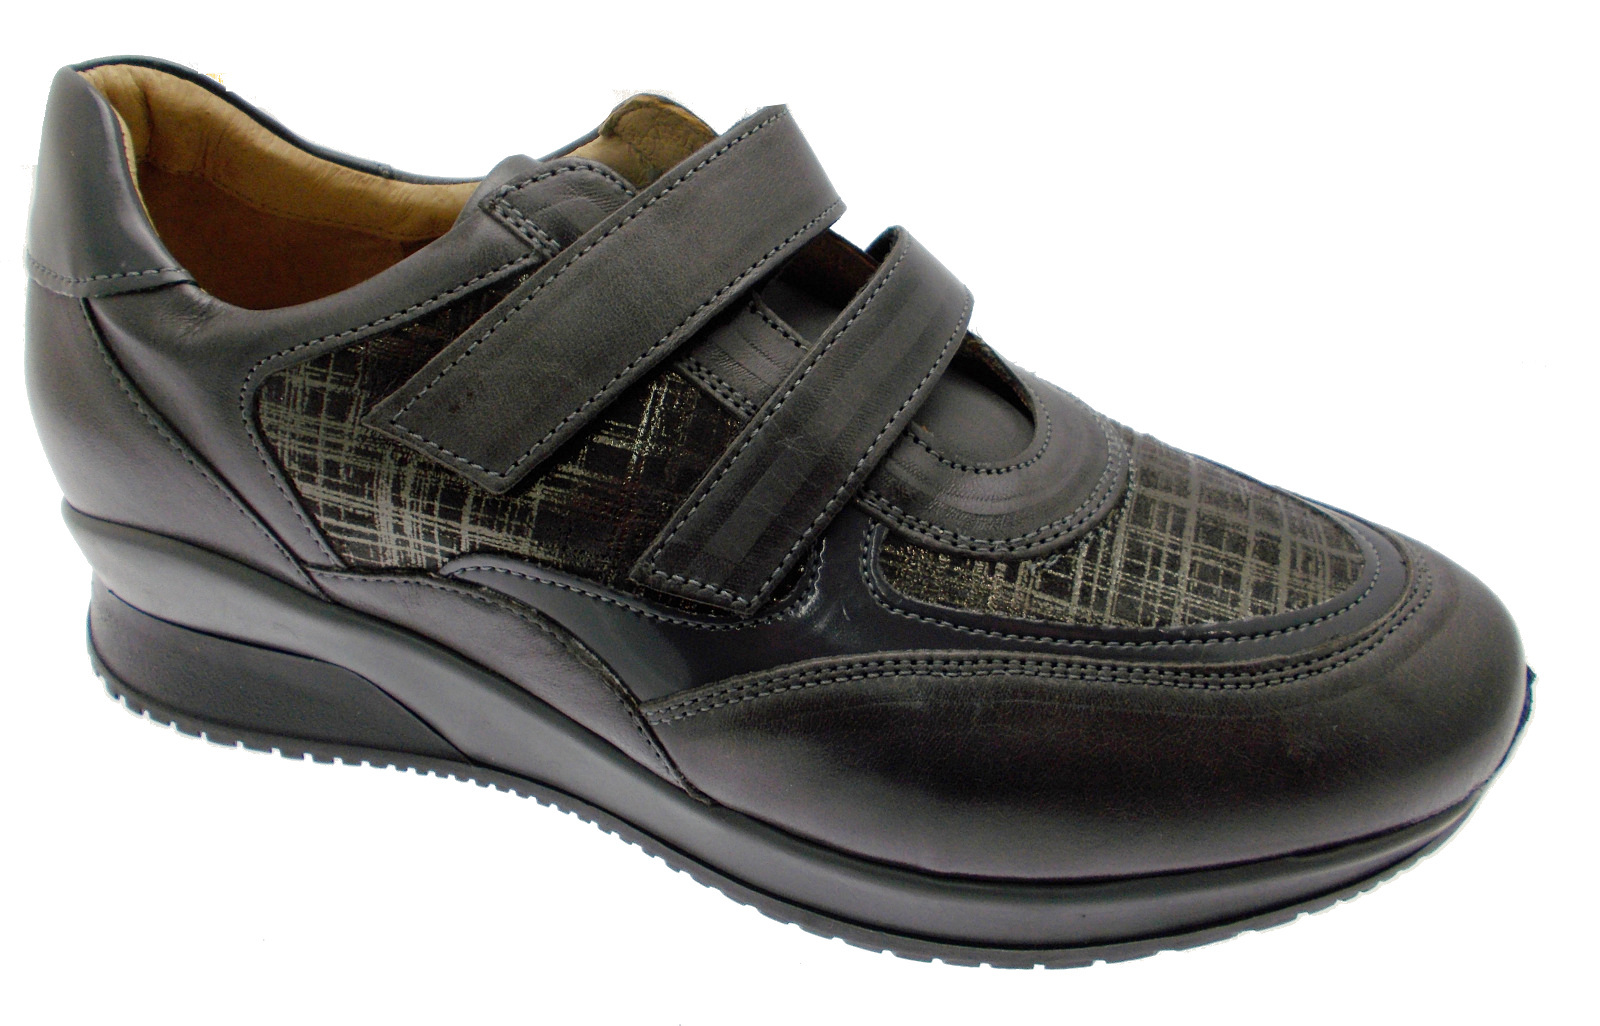 Art C3720 scarpa donna ortopedica  grigio  sneaker Loren